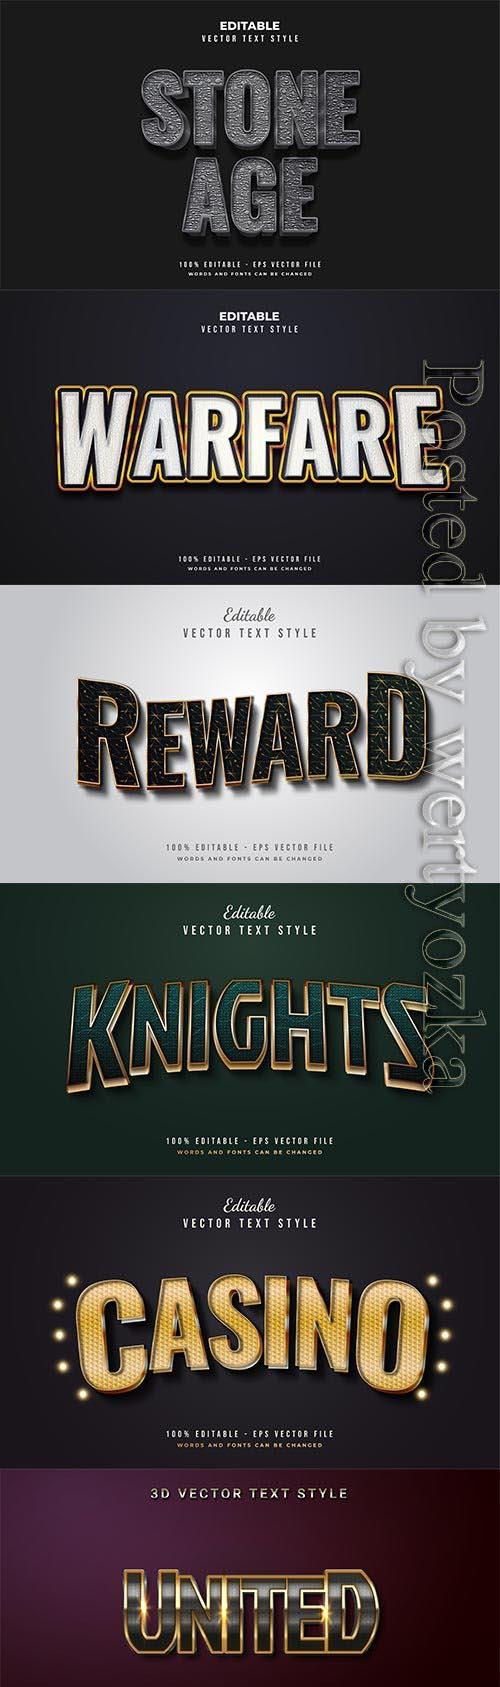 3d editable text style effect vector vol 642